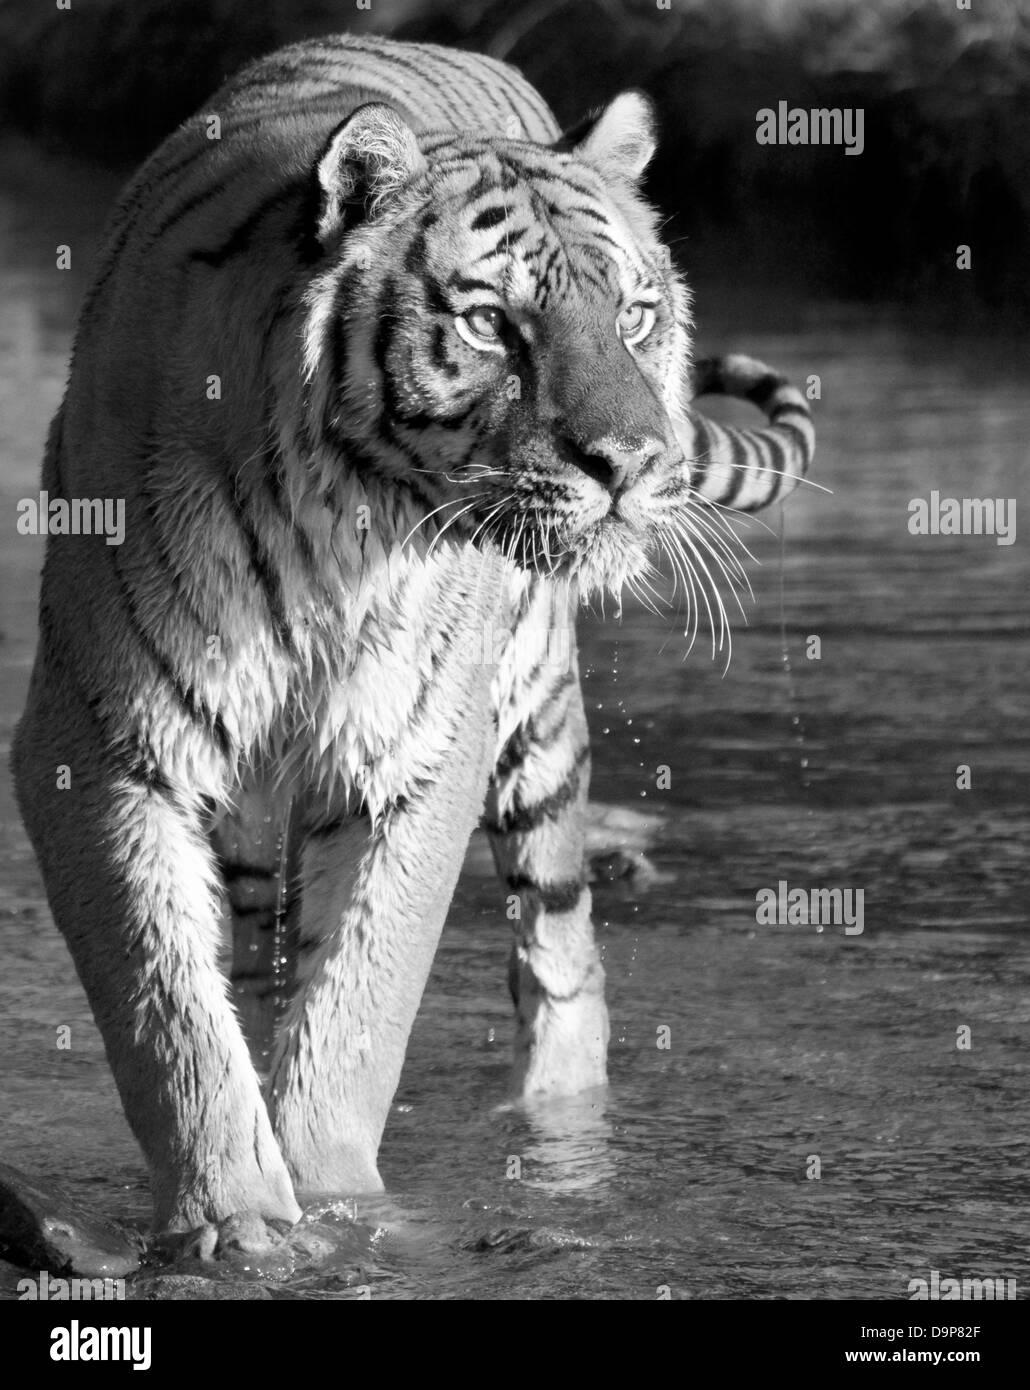 Siberian Tiger walking through a stream. - Stock Image